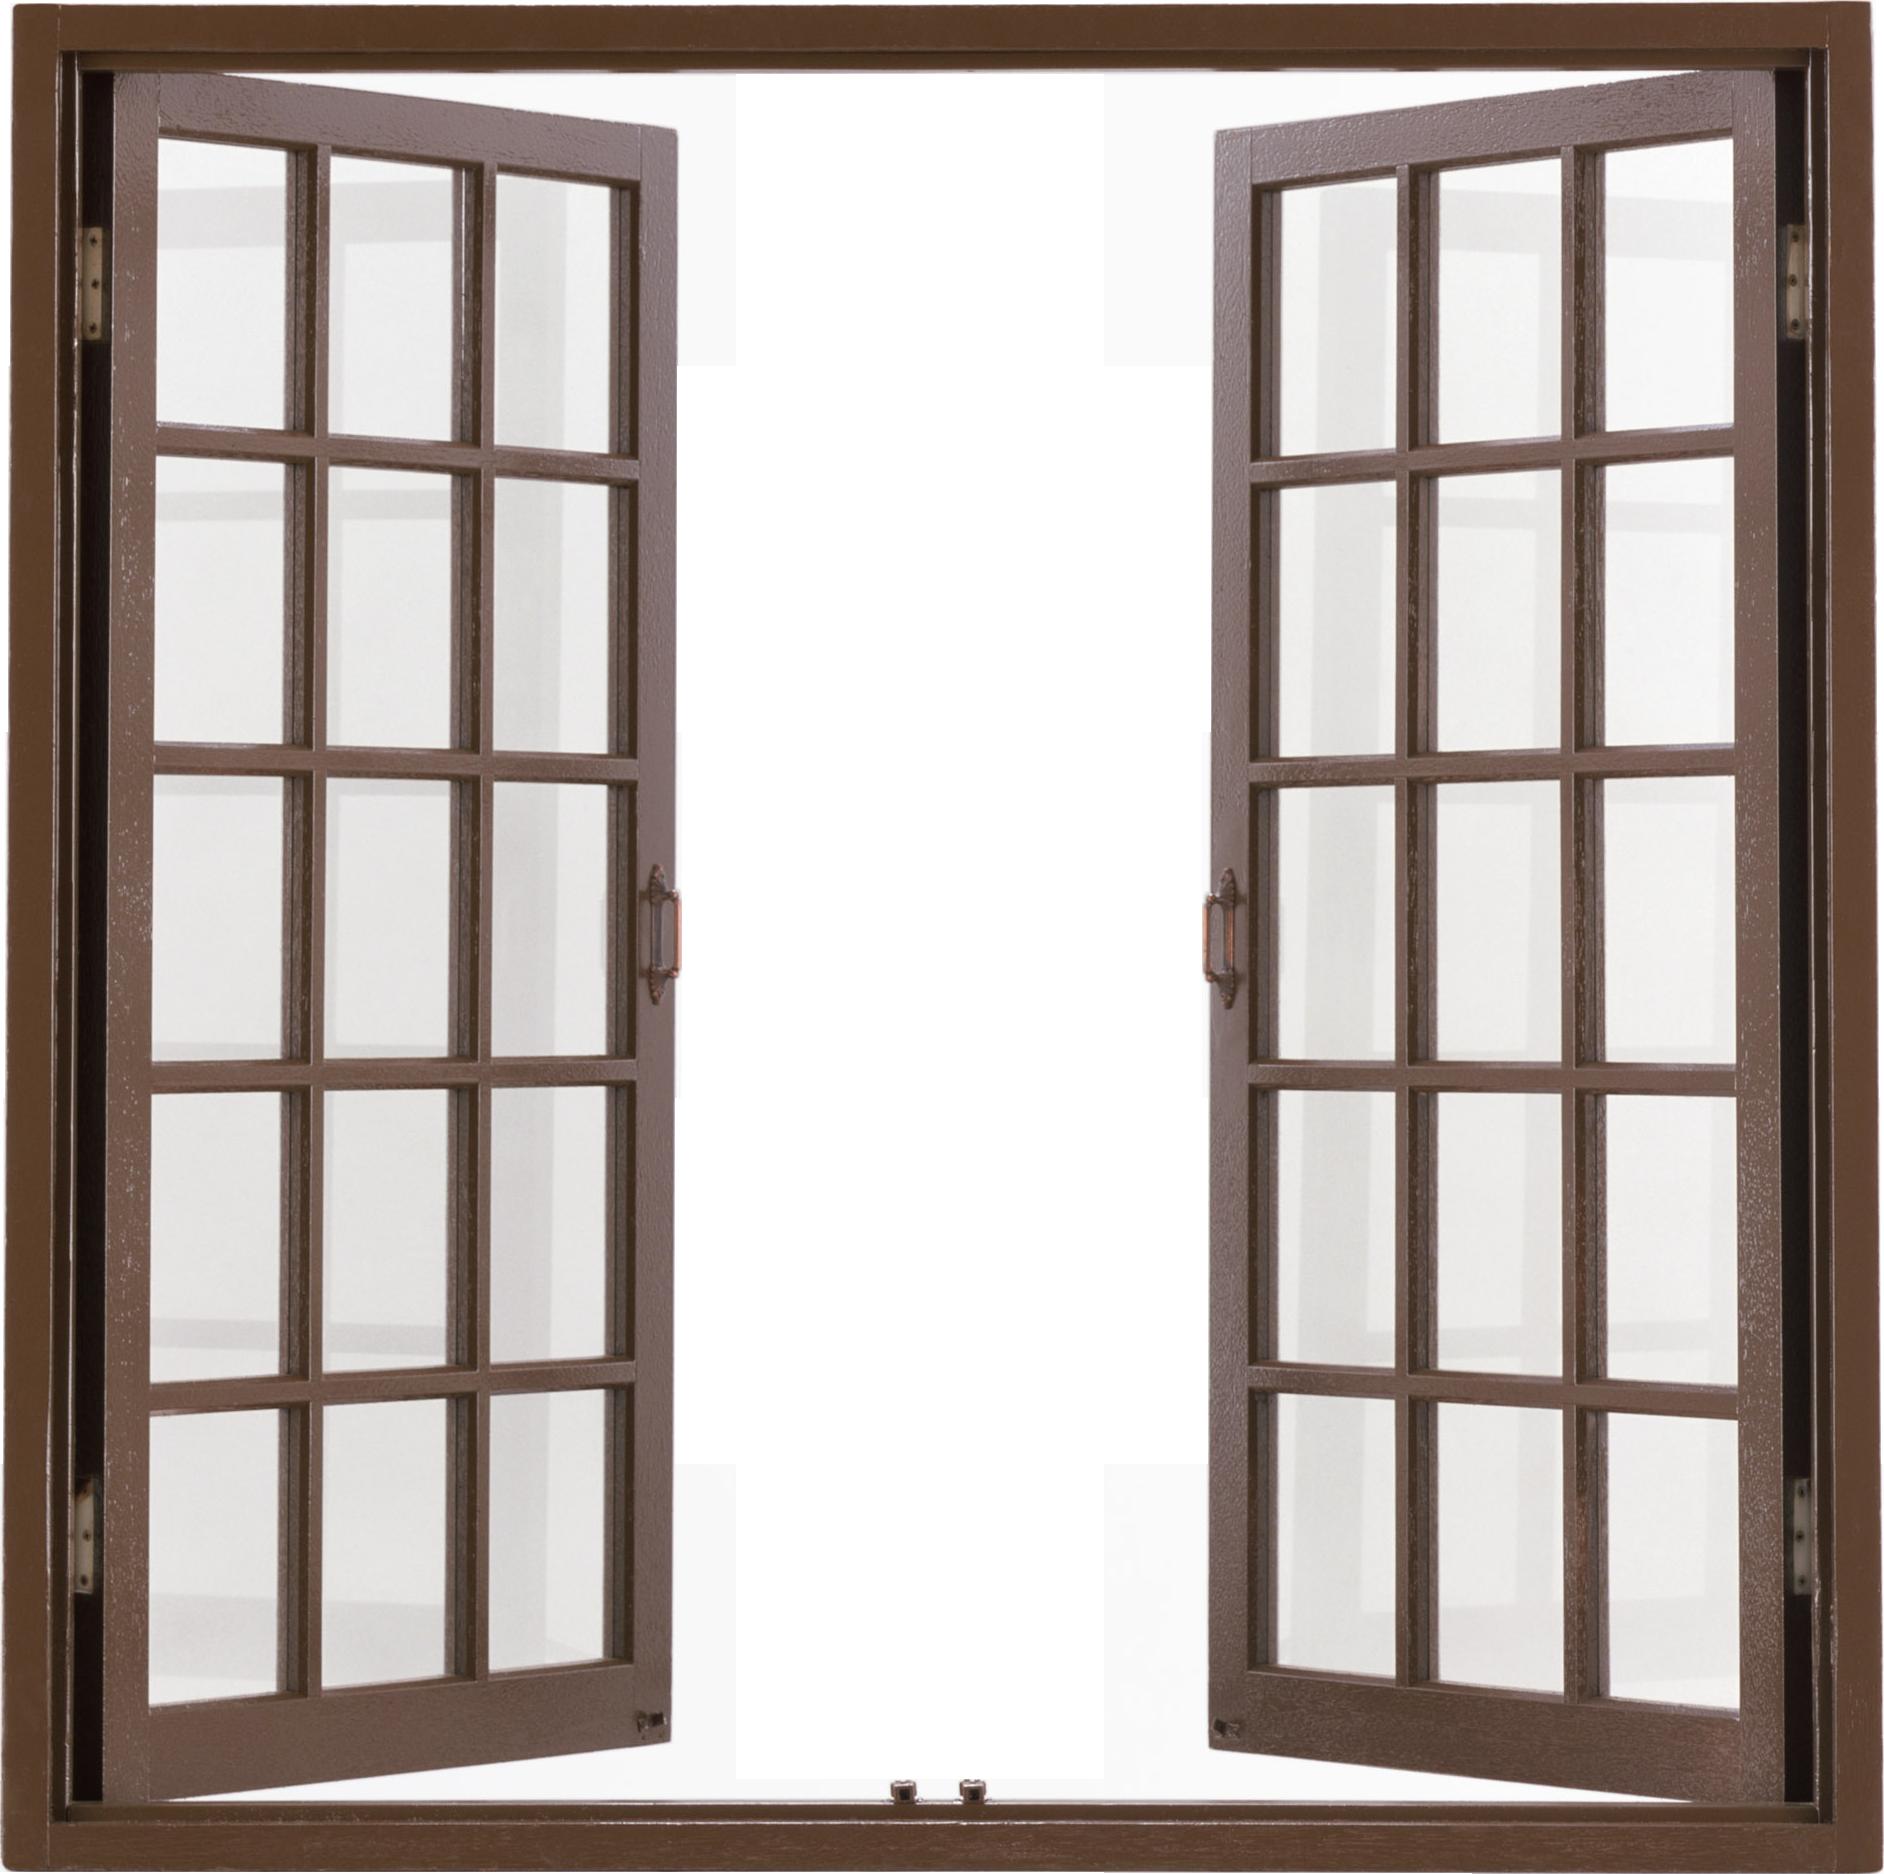 Window Clipart Transparent Background.